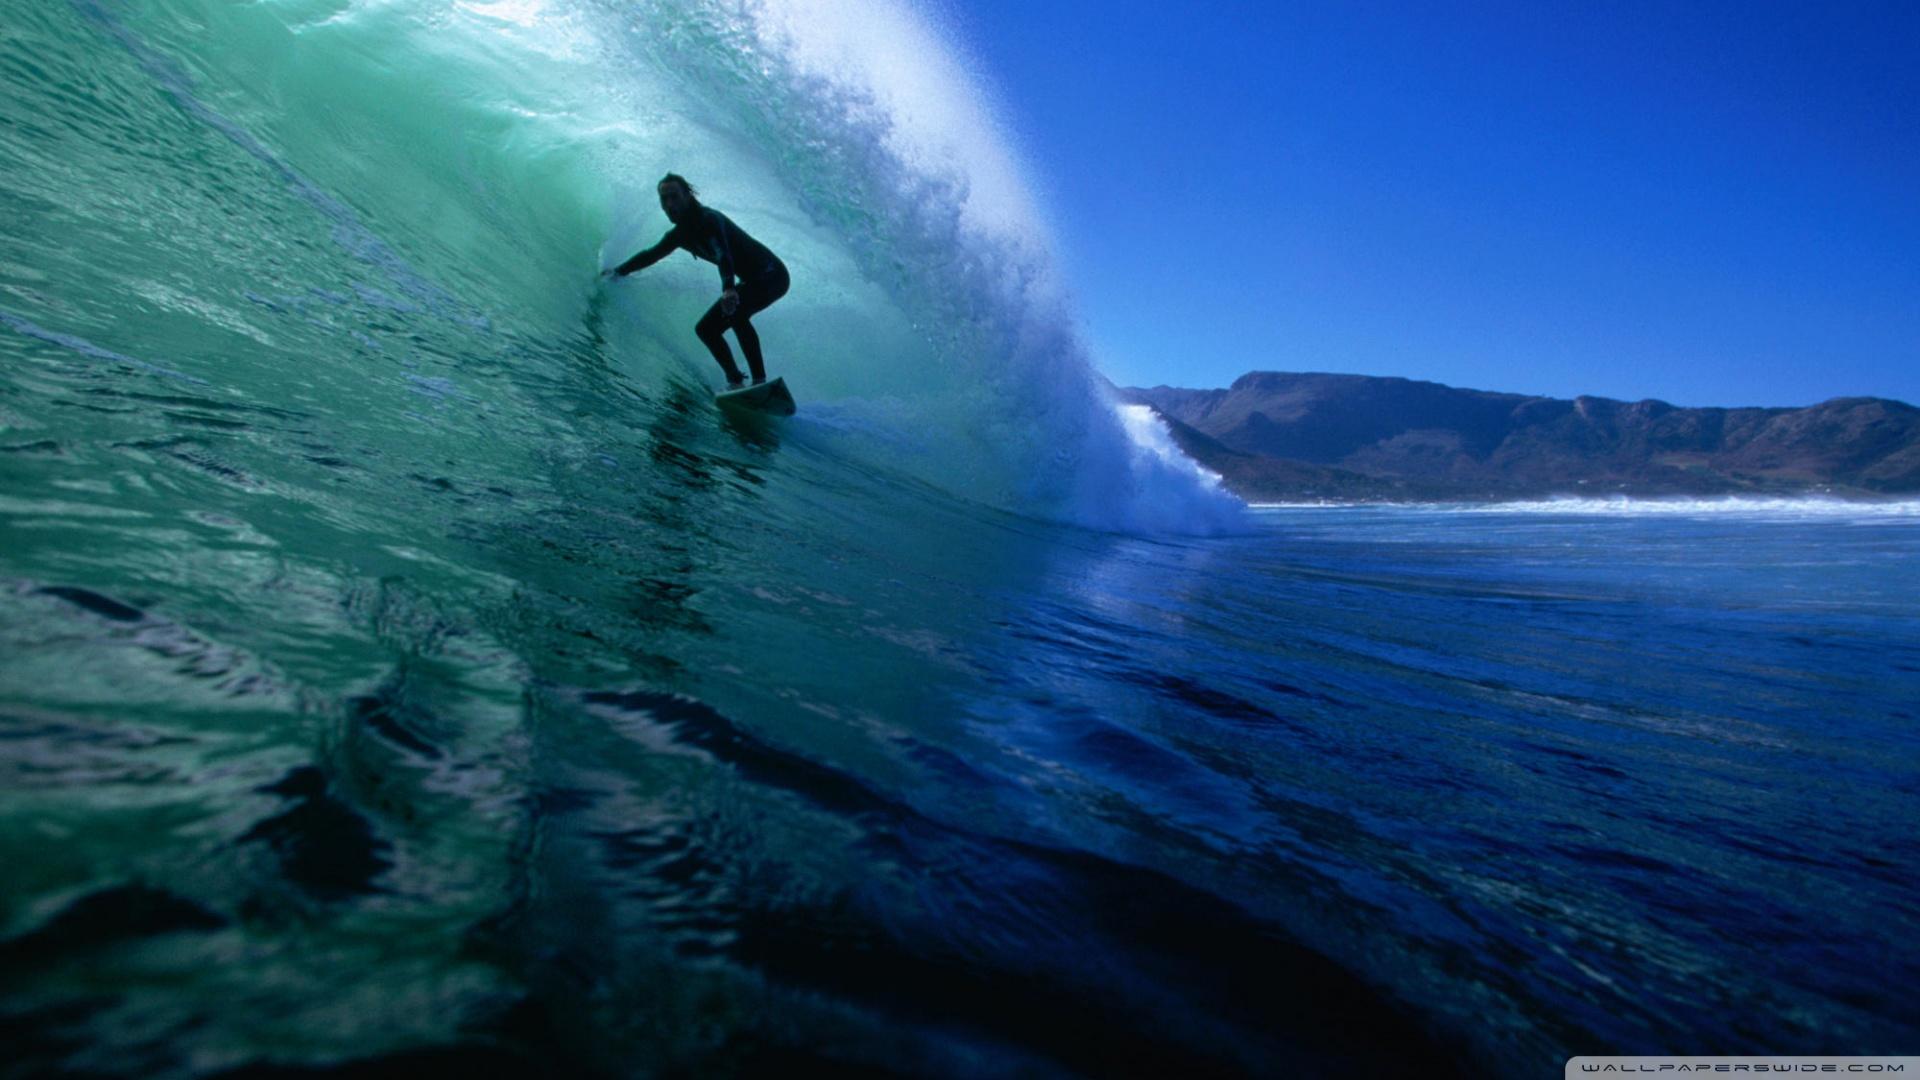 Image: Surf wallpaper HD 0015 - Album: Surf: Wallpaper, wallpapers ...